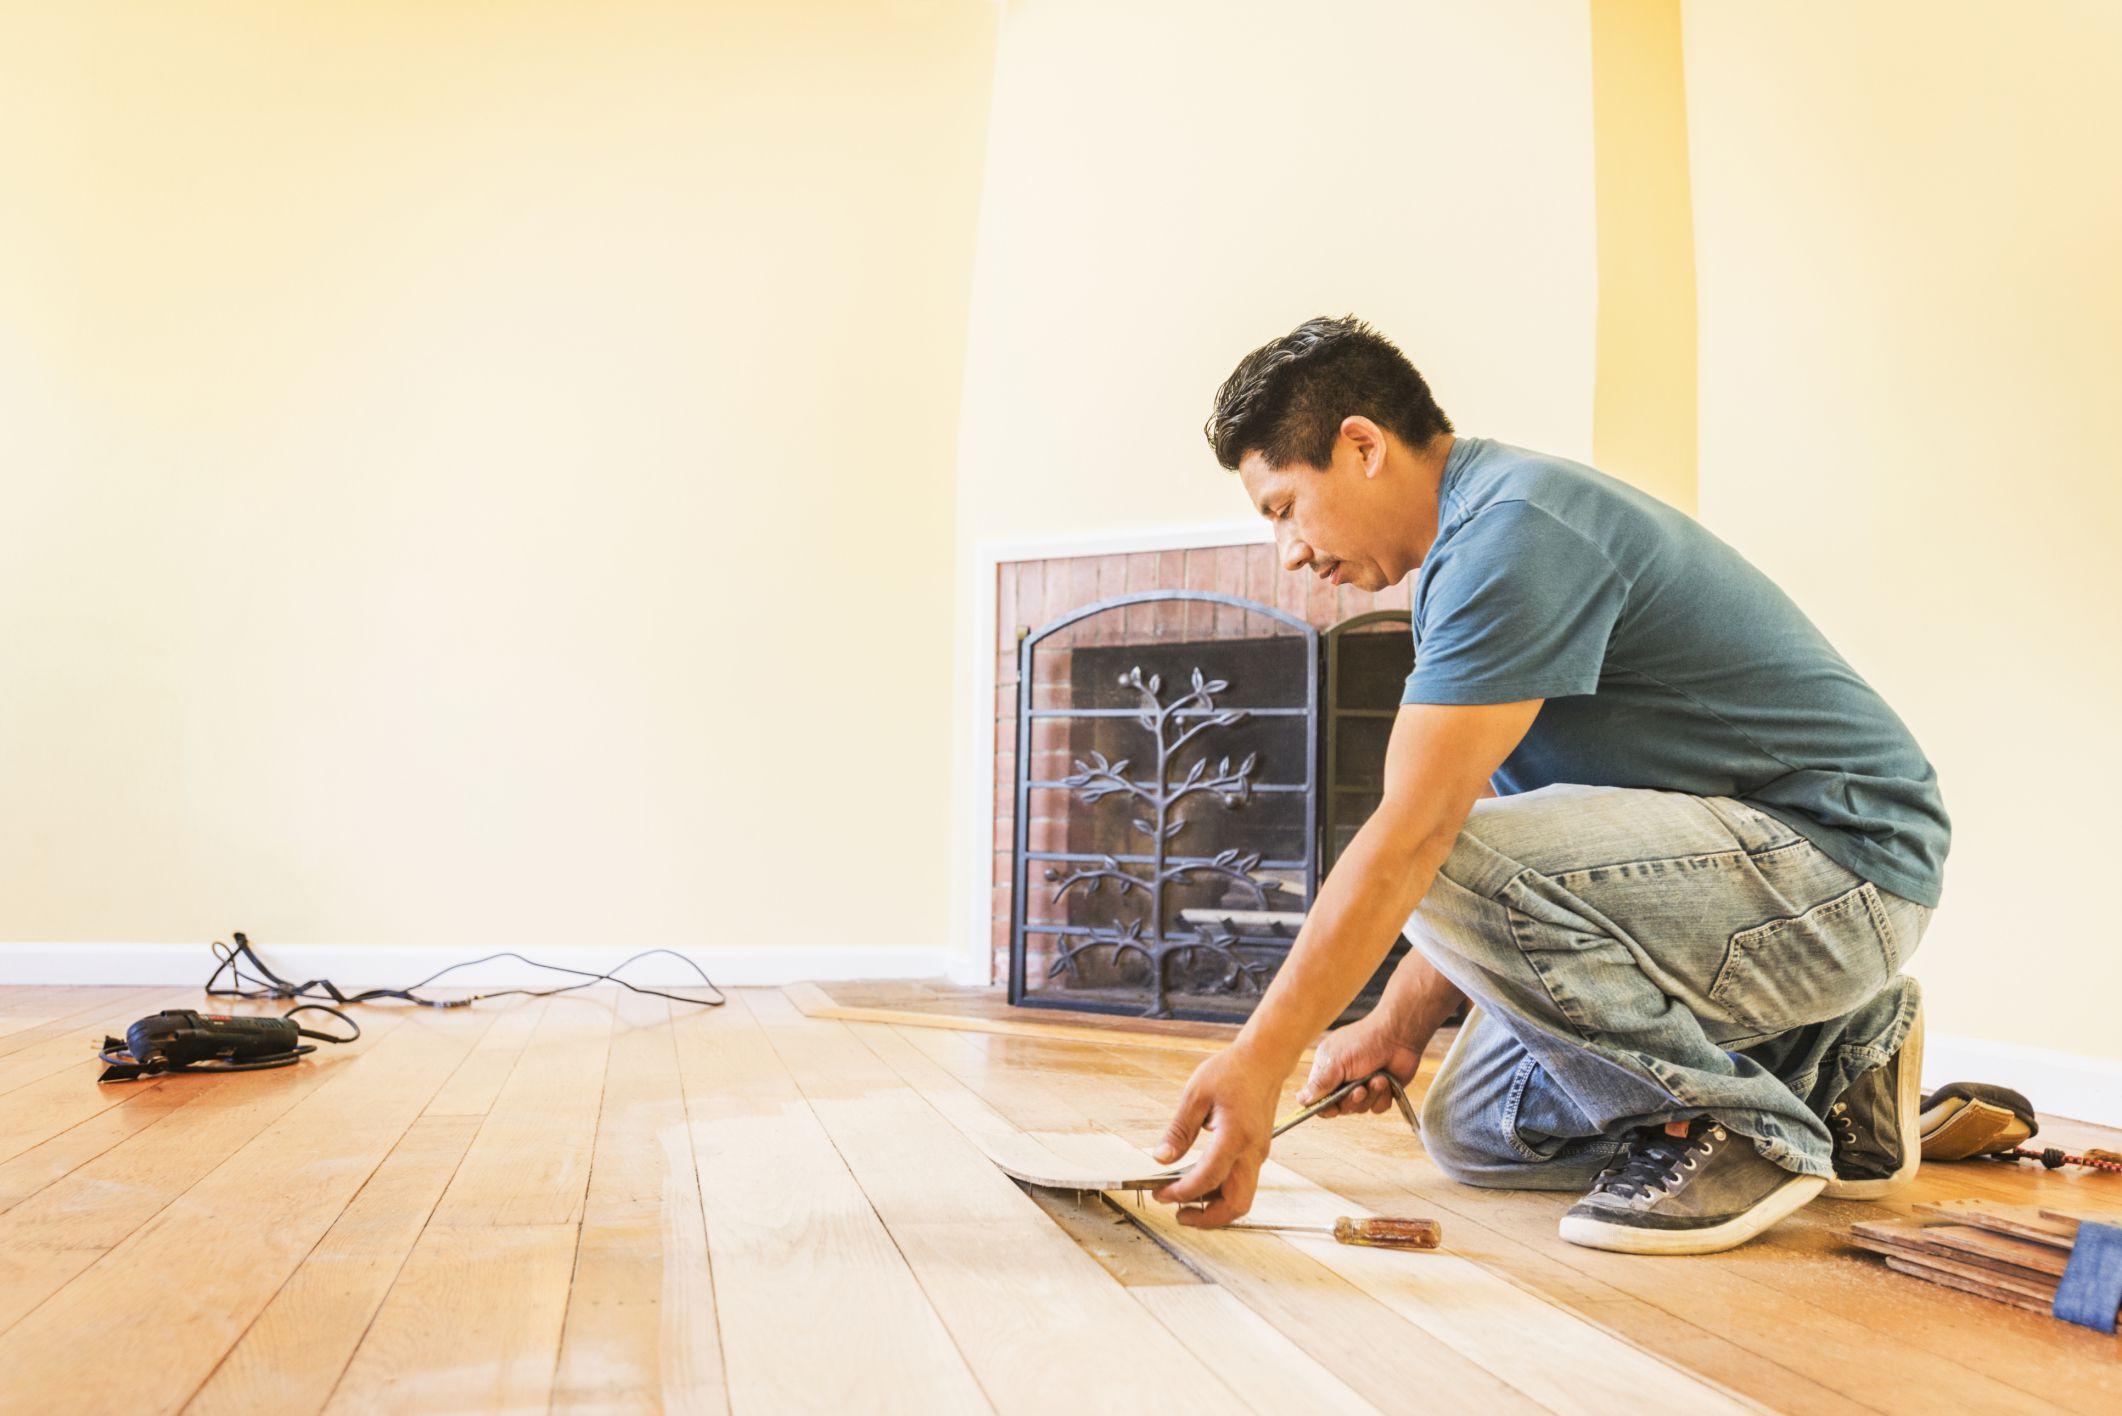 hardwood floor finish home depot of solid hardwood flooring costs for professional vs diy regarding installwoodflooring 592016327 56684d6f3df78ce1610a598a